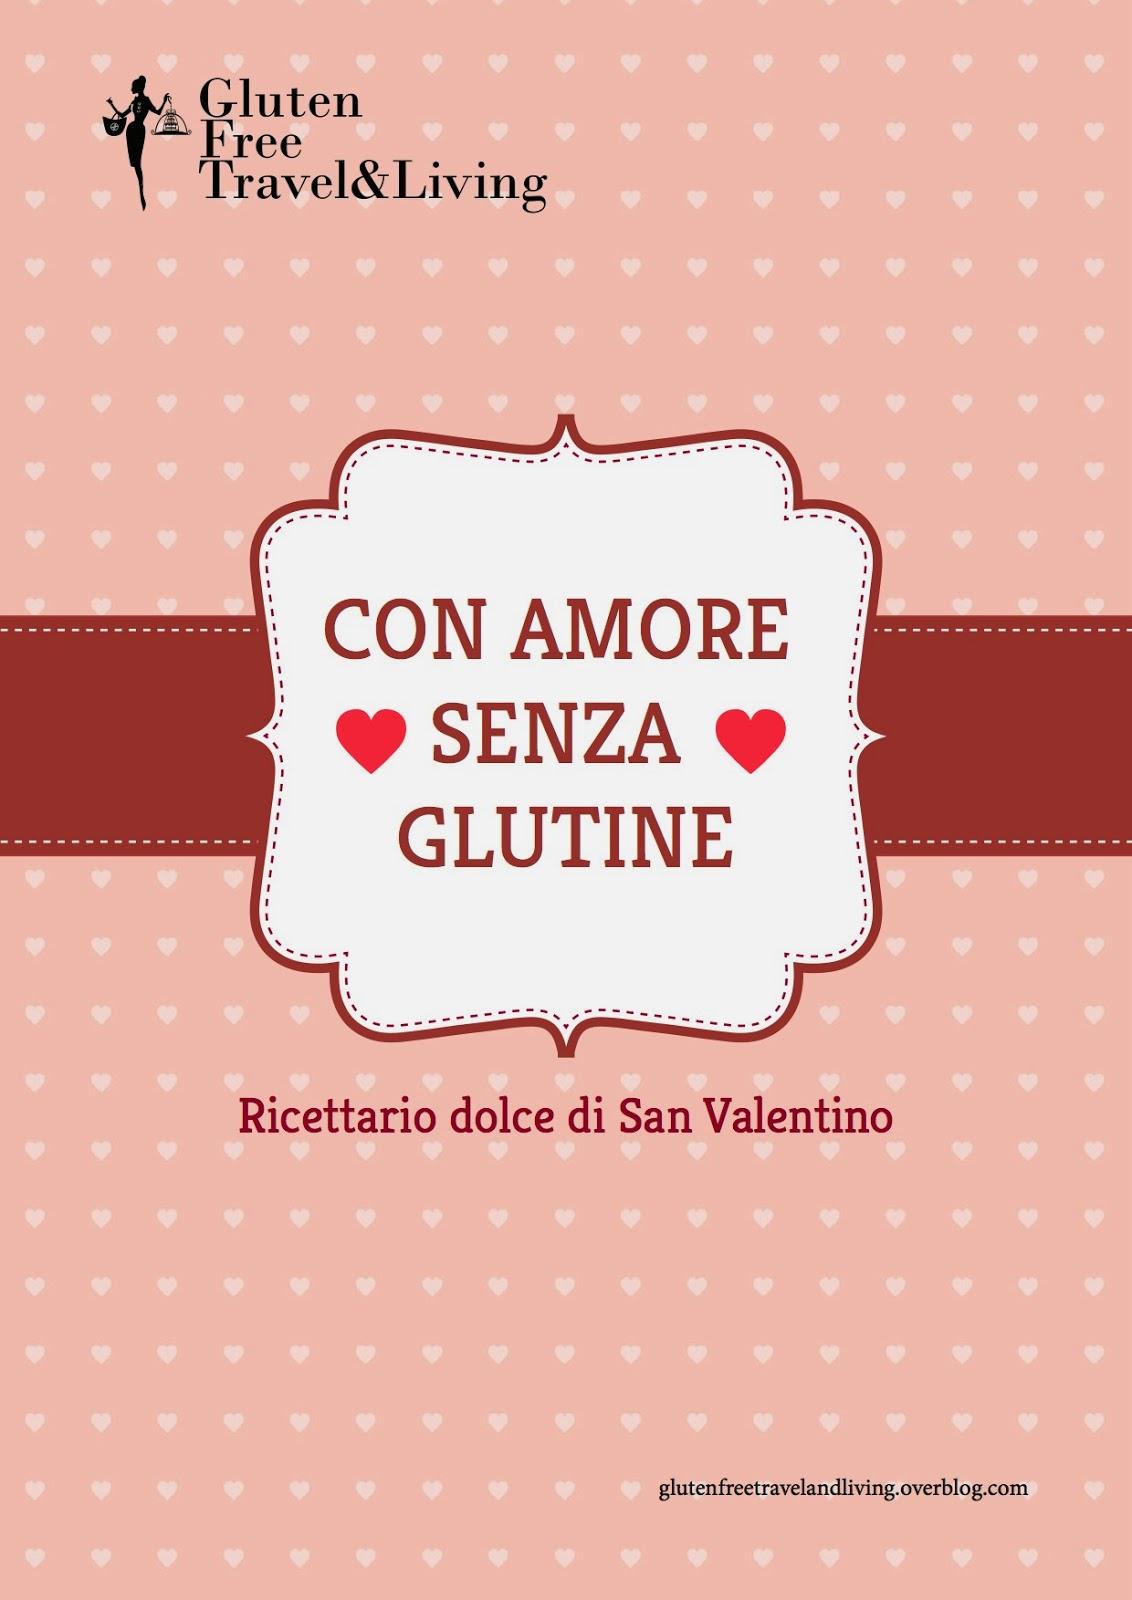 http://glutenfreetavelandliving.over-blog.com/2014/02/con-amore-senza-glutine.-ricettario-dolce-di-san-valentino.html